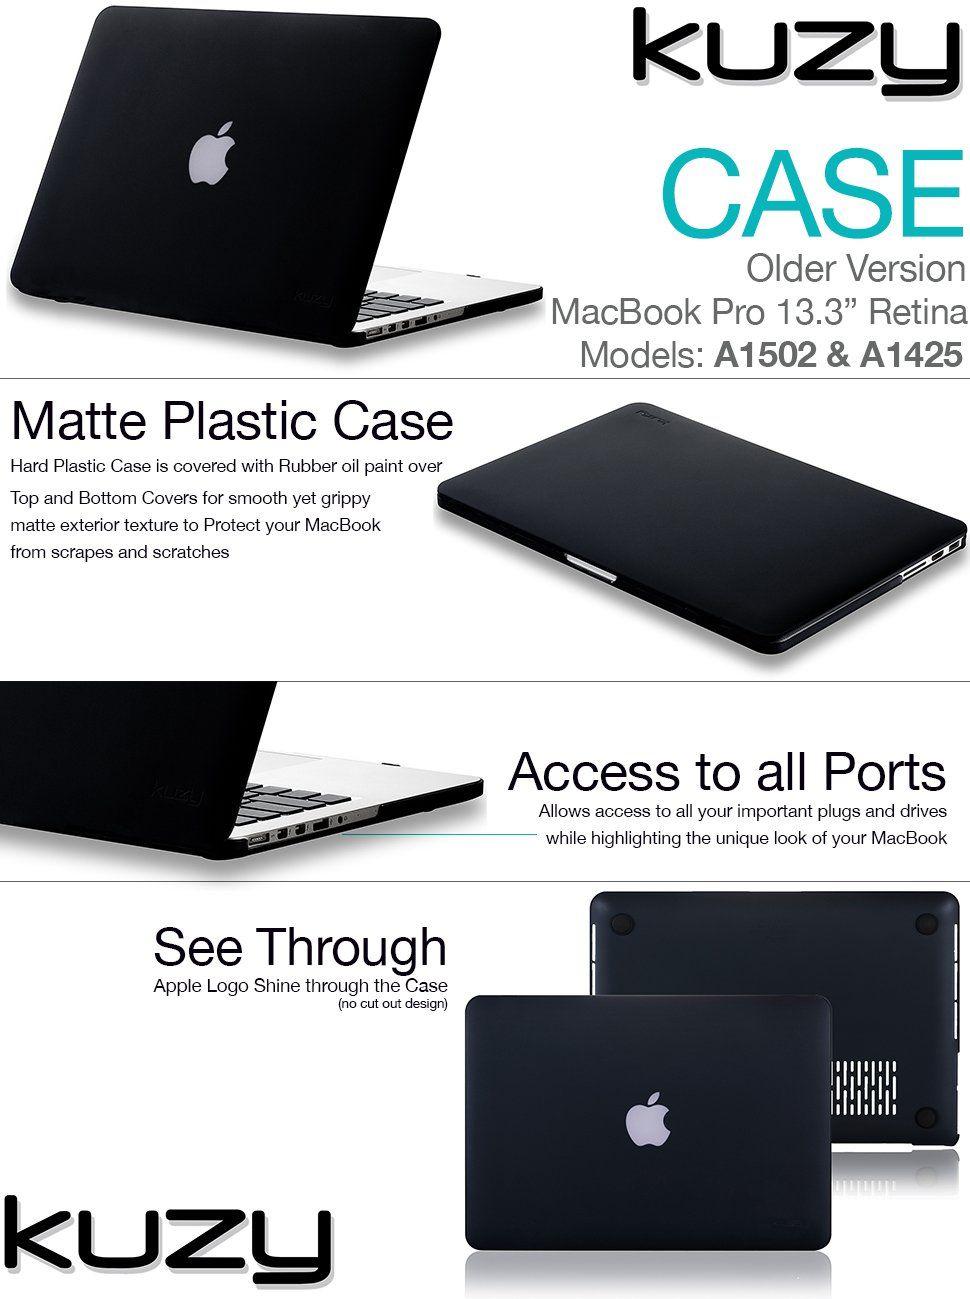 super popular 5b63c 7a254 Amazon.com : Kuzy - Rubberized Hard Case for Older MacBook Pro 13.3 ...